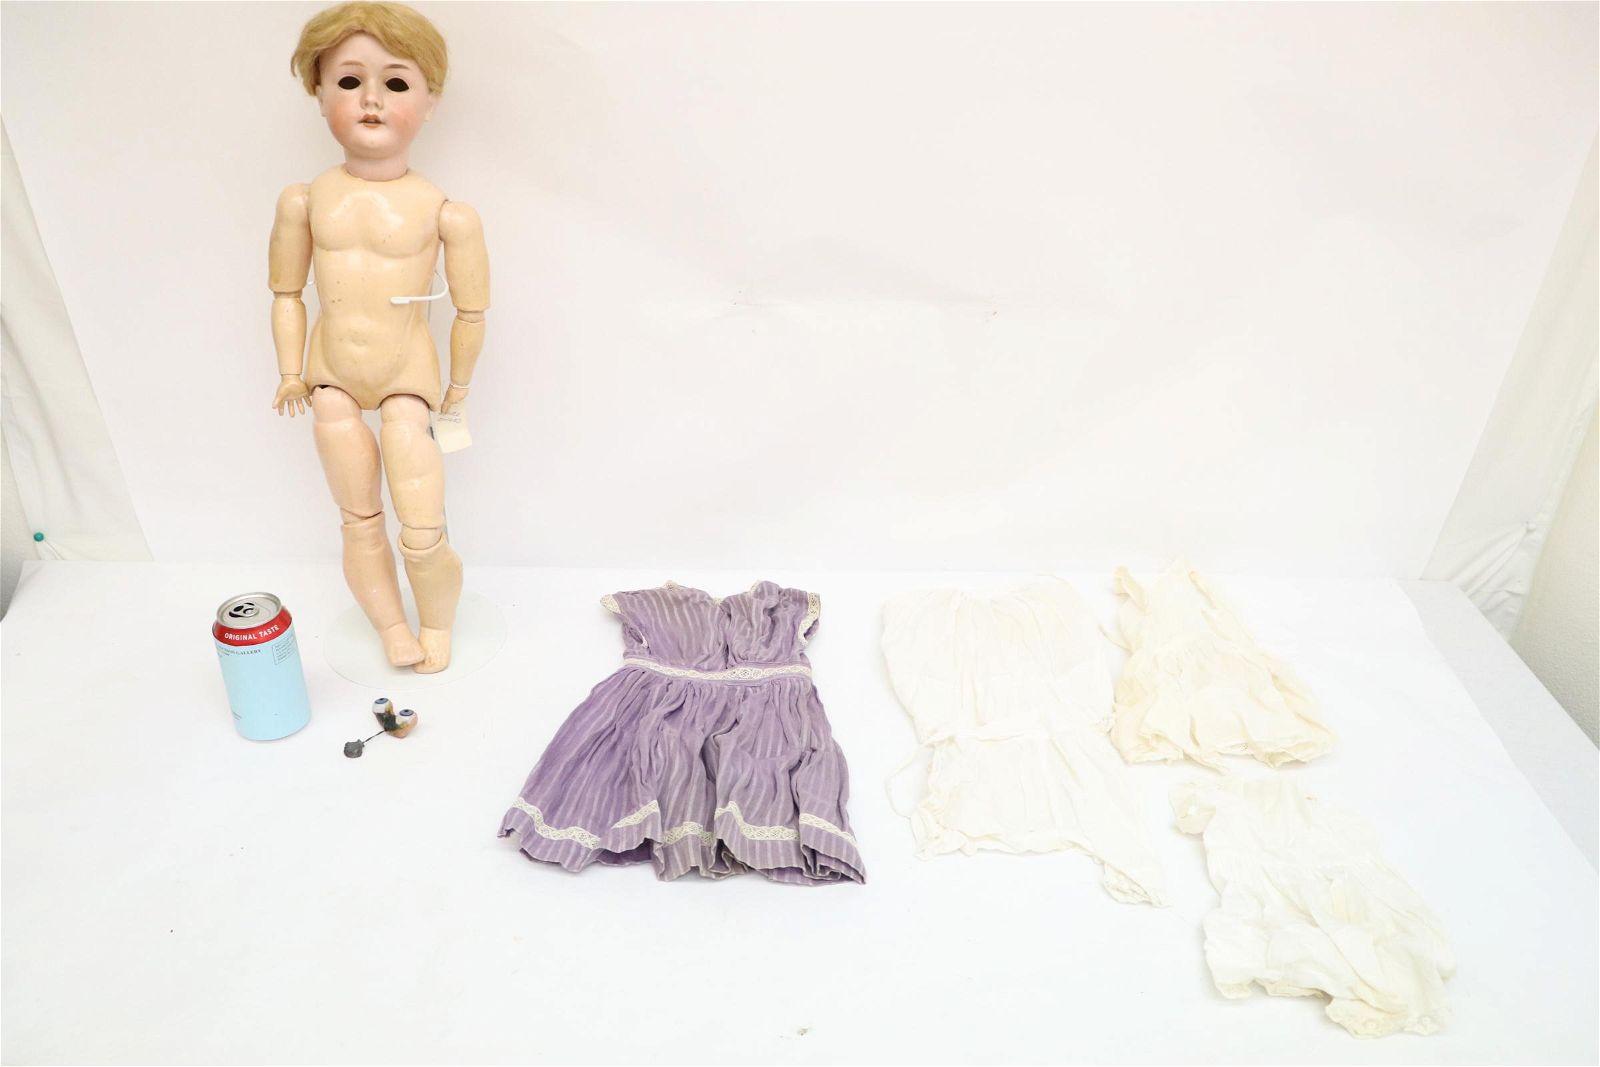 Large antique German bisque head doll